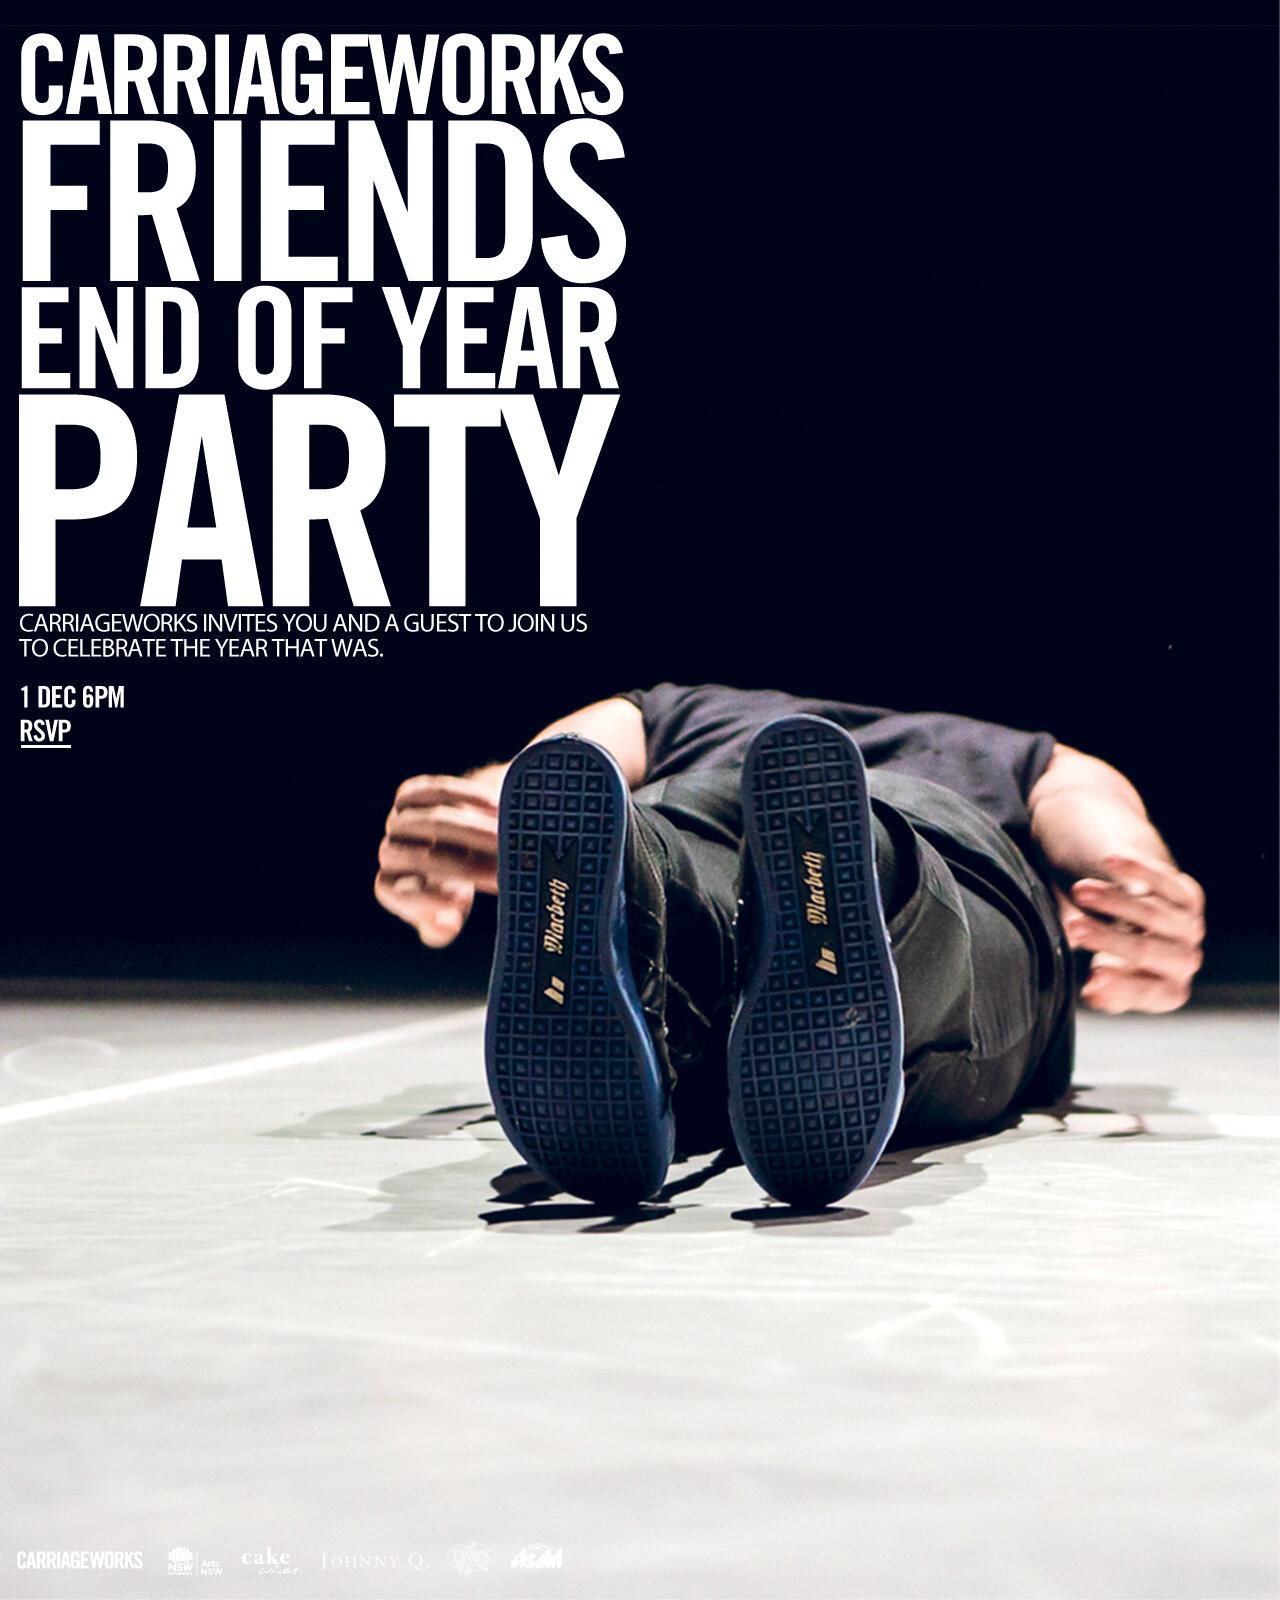 EOY-Party-3.jpg